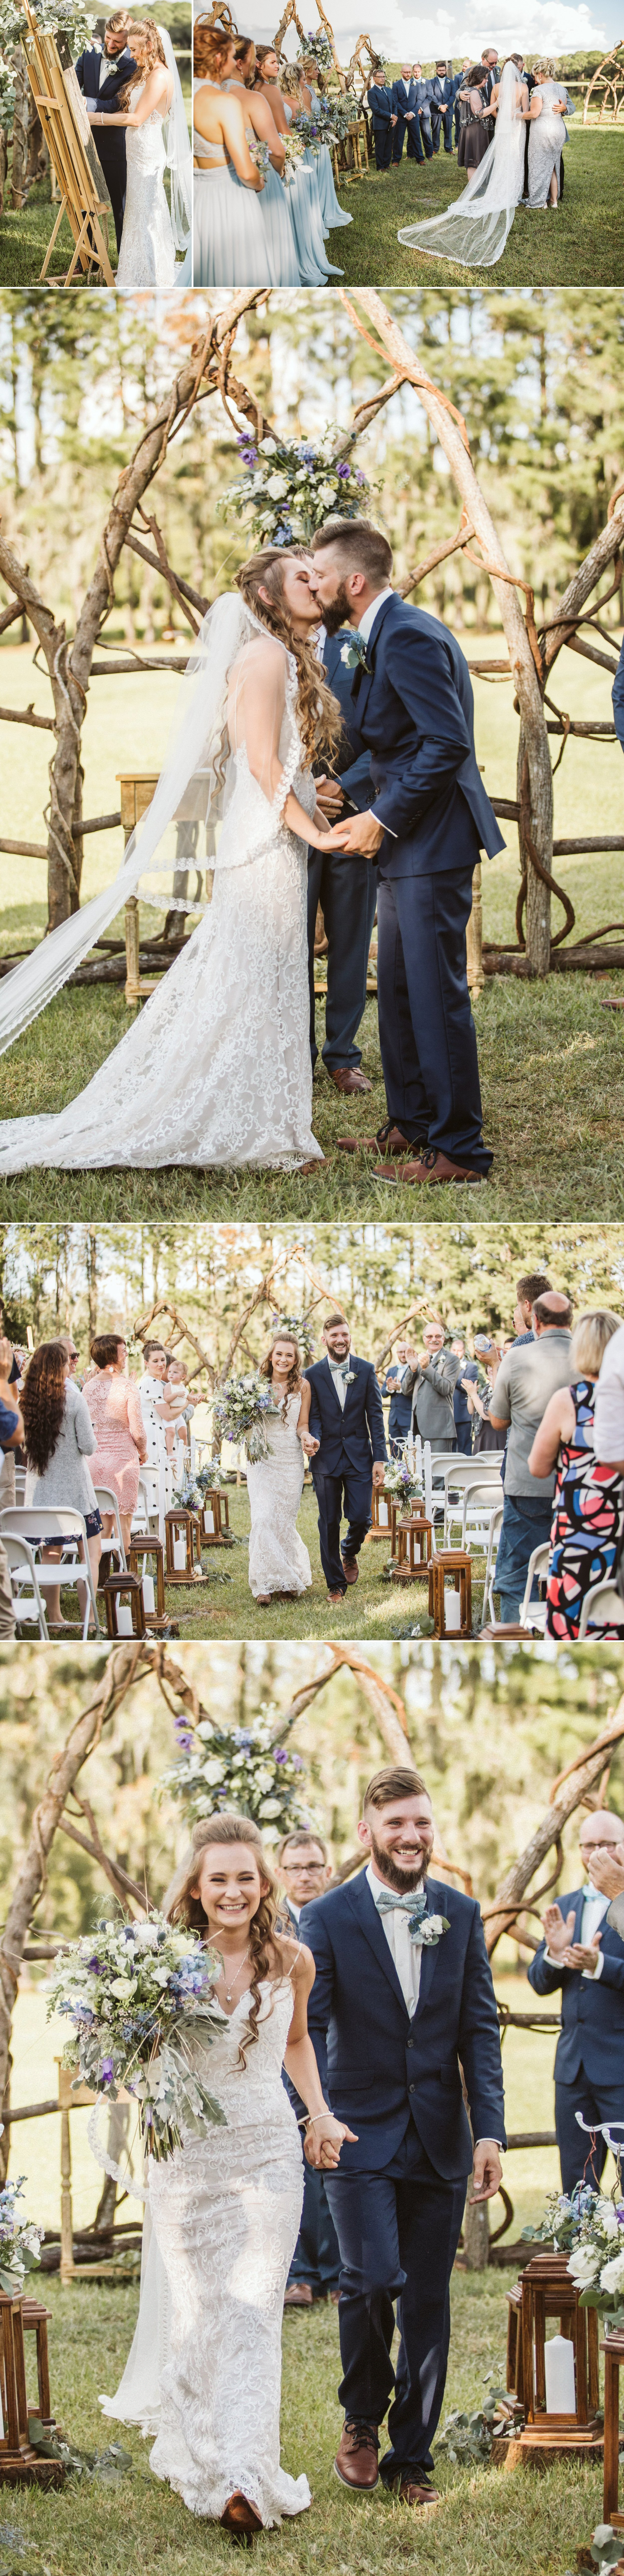 Romantic Floral Outdoor Field Chapel Wedding- Sarasota Florida- Courtney & Isaac18.jpg